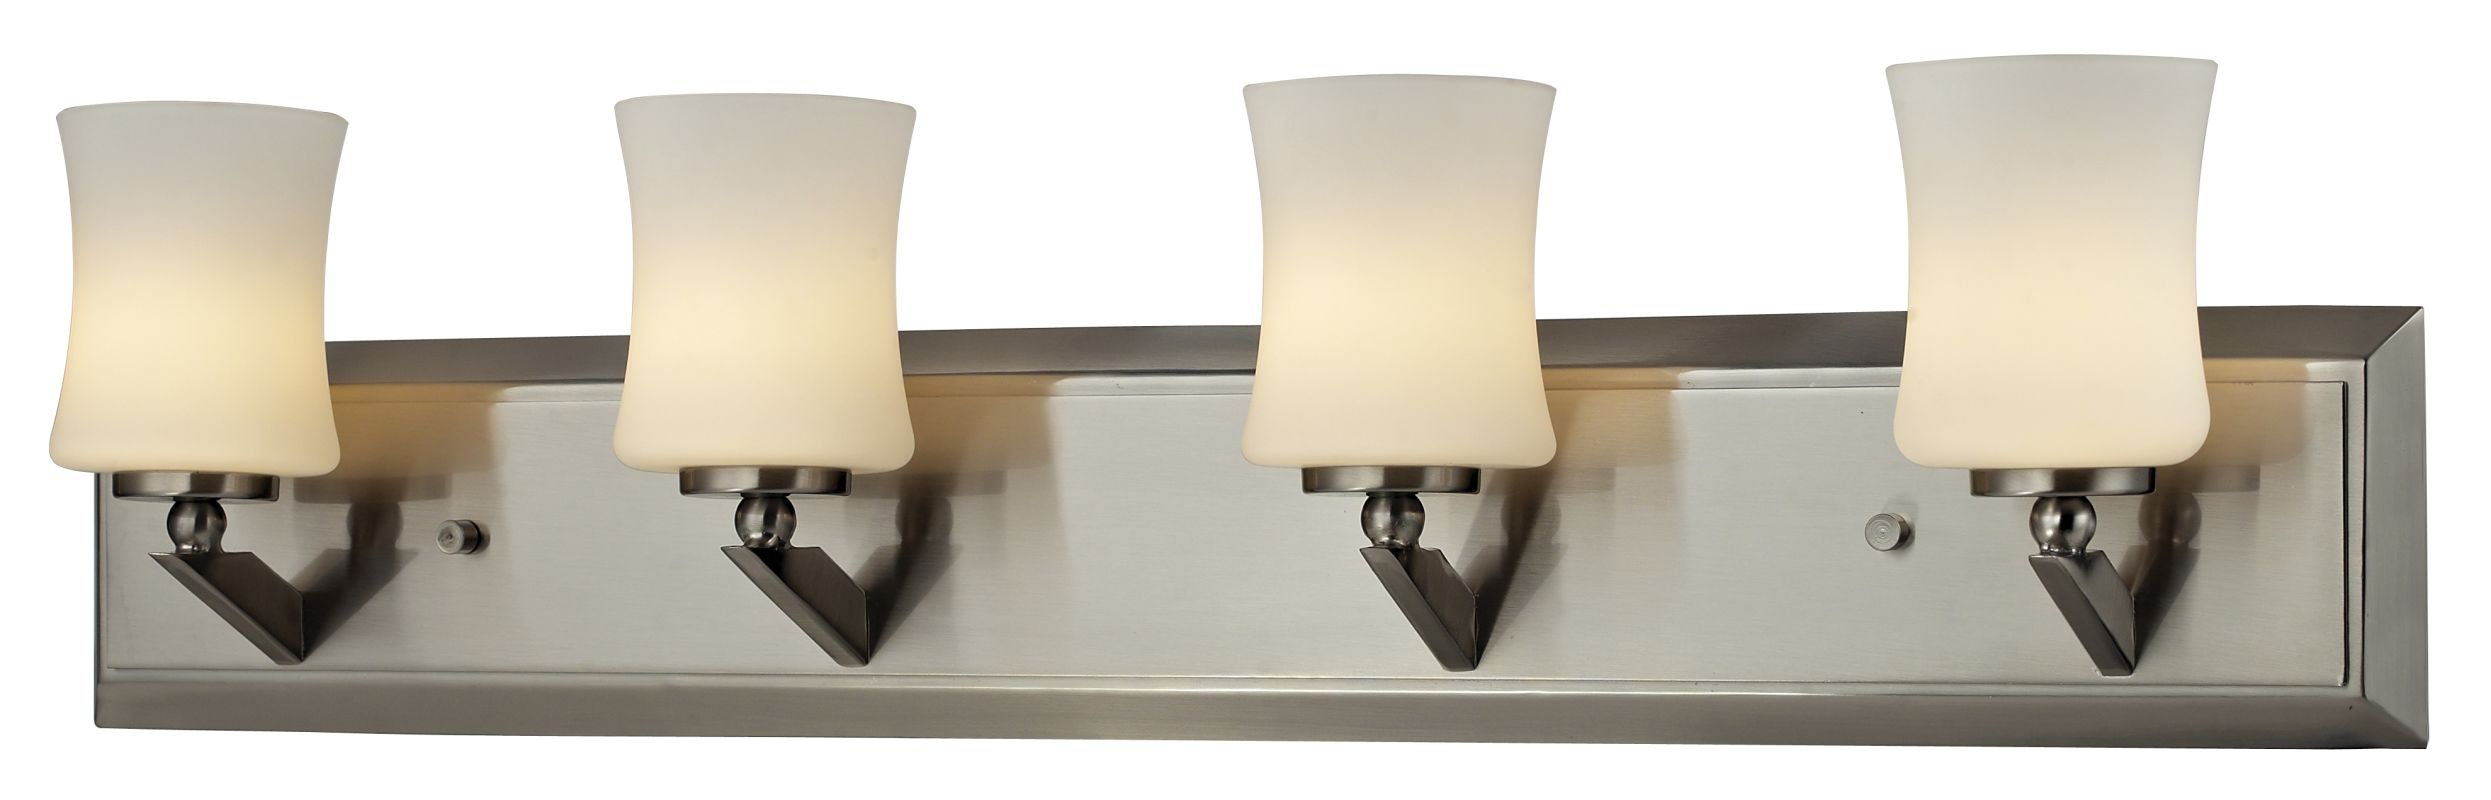 Z-Lite 609-4V Elite 4 Light Bathroom Vanity Light with Matte Opal